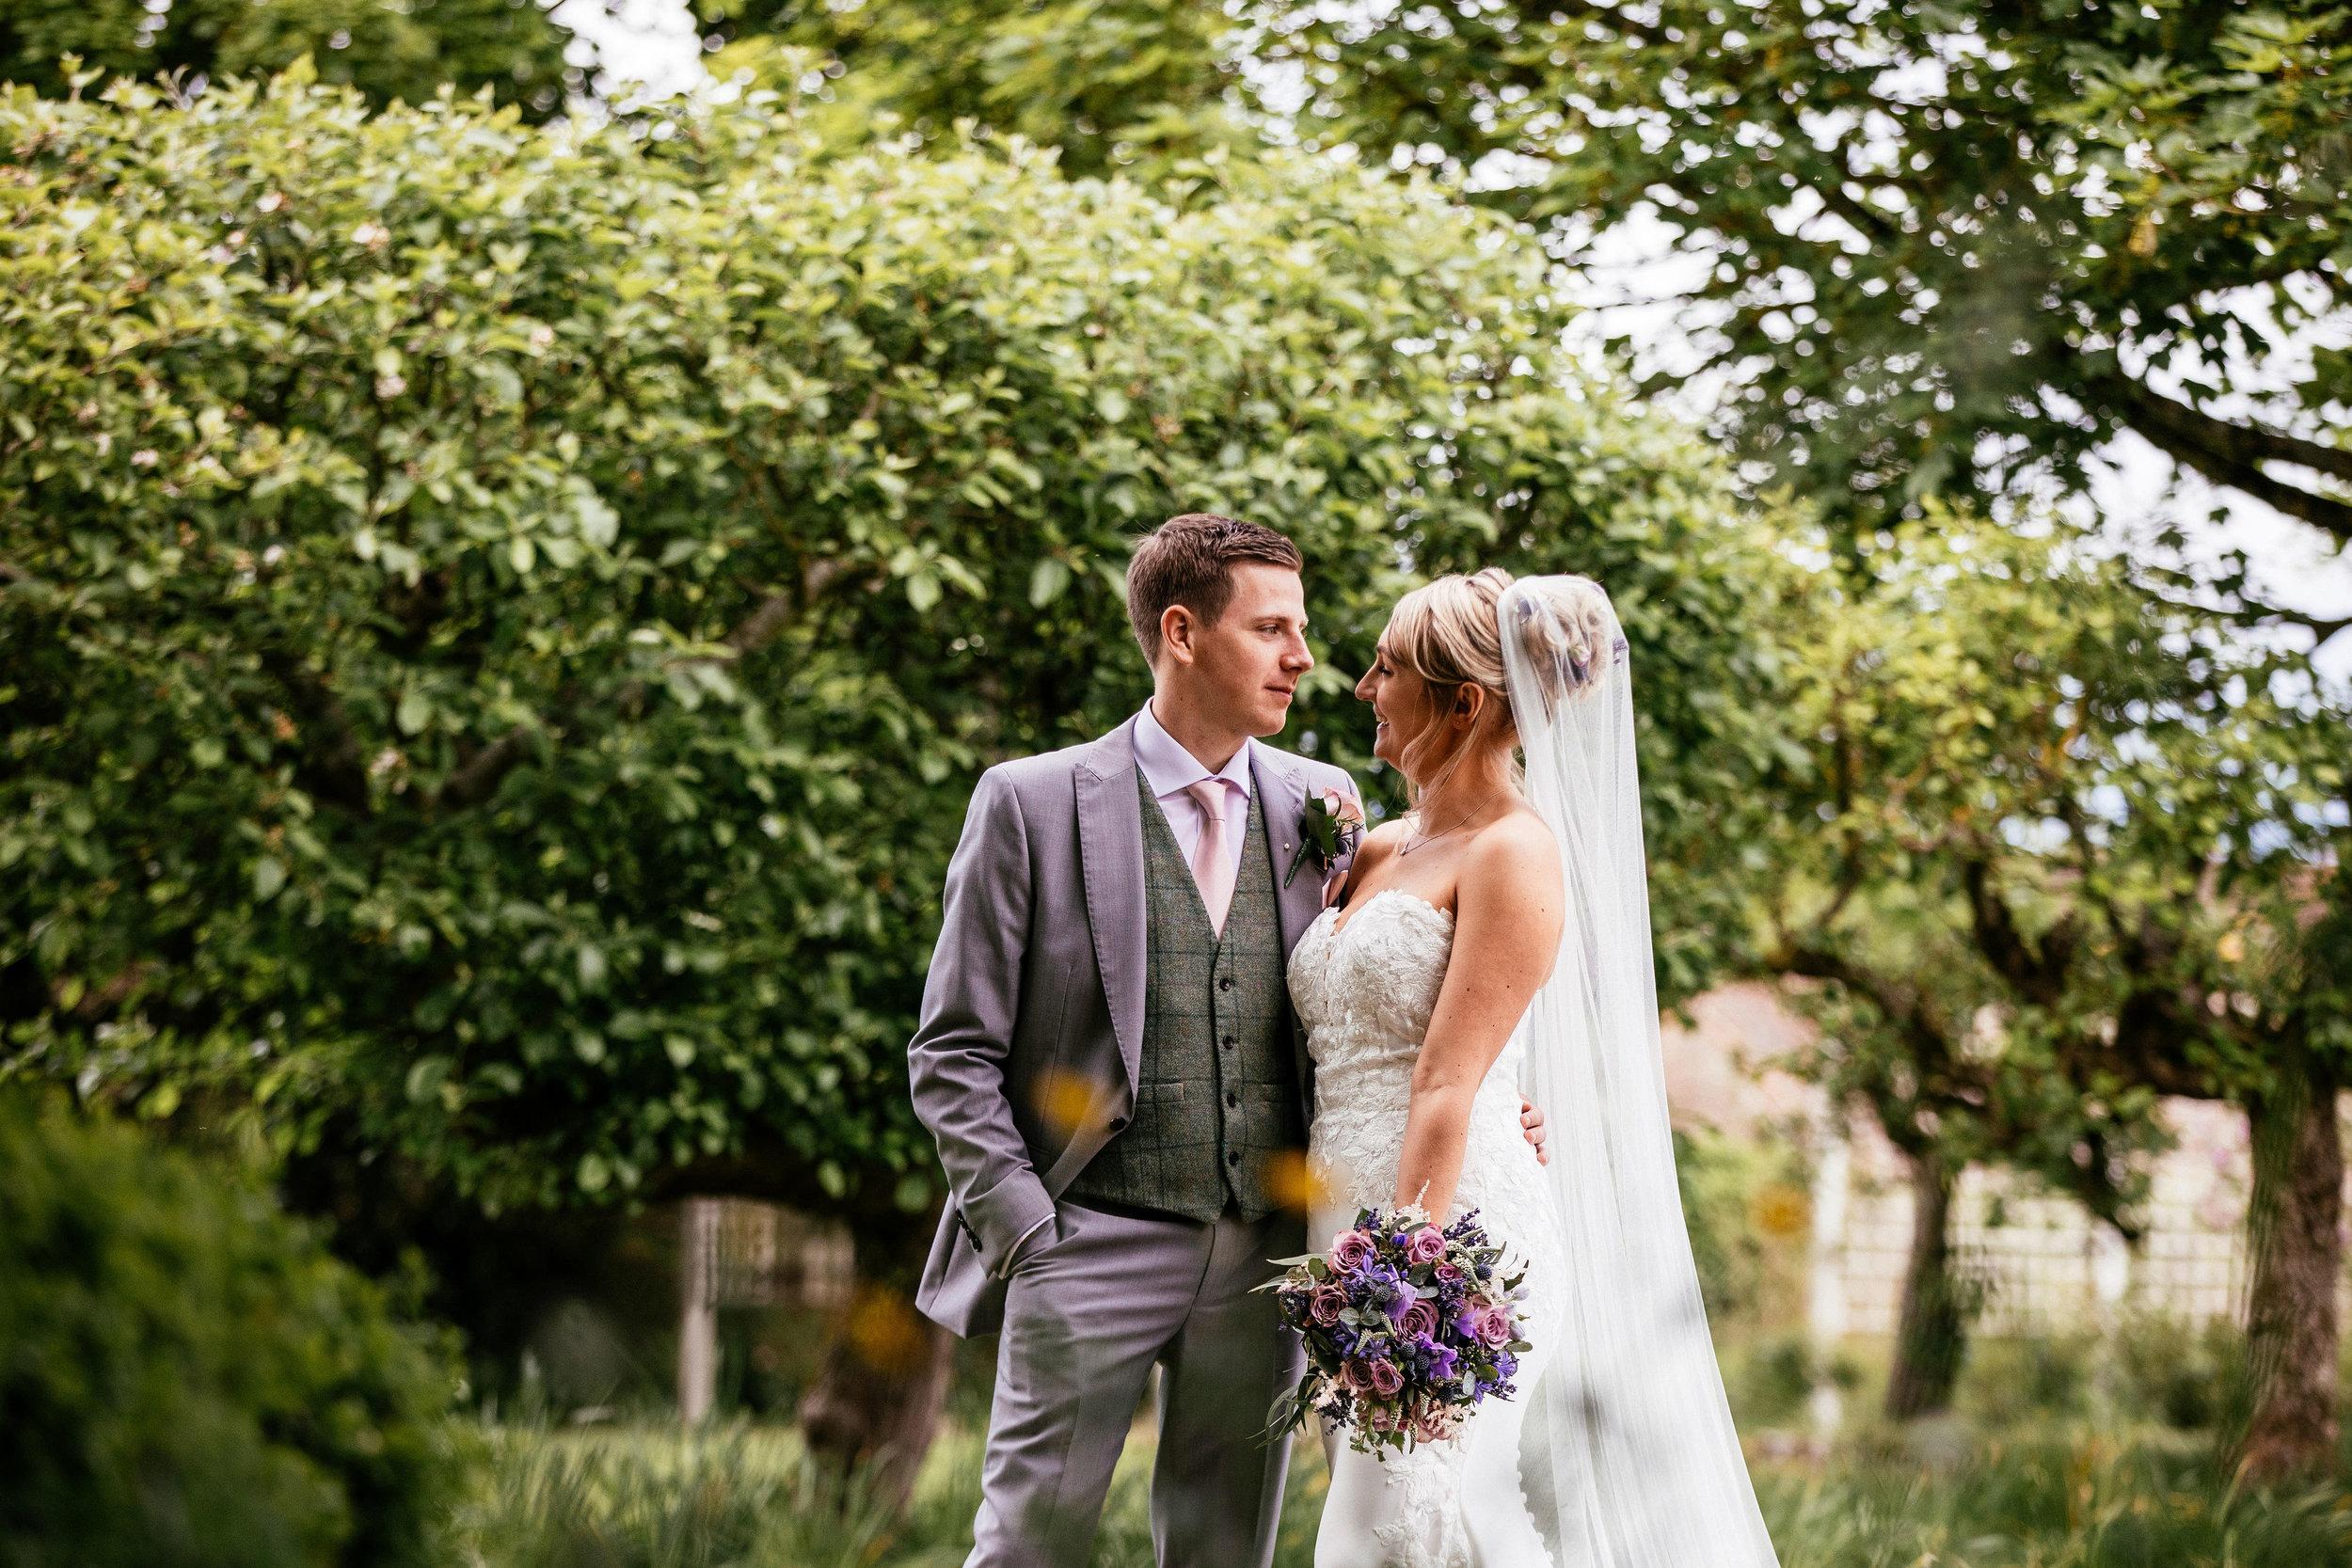 Becky-and-Sam-Wedding-662.jpg